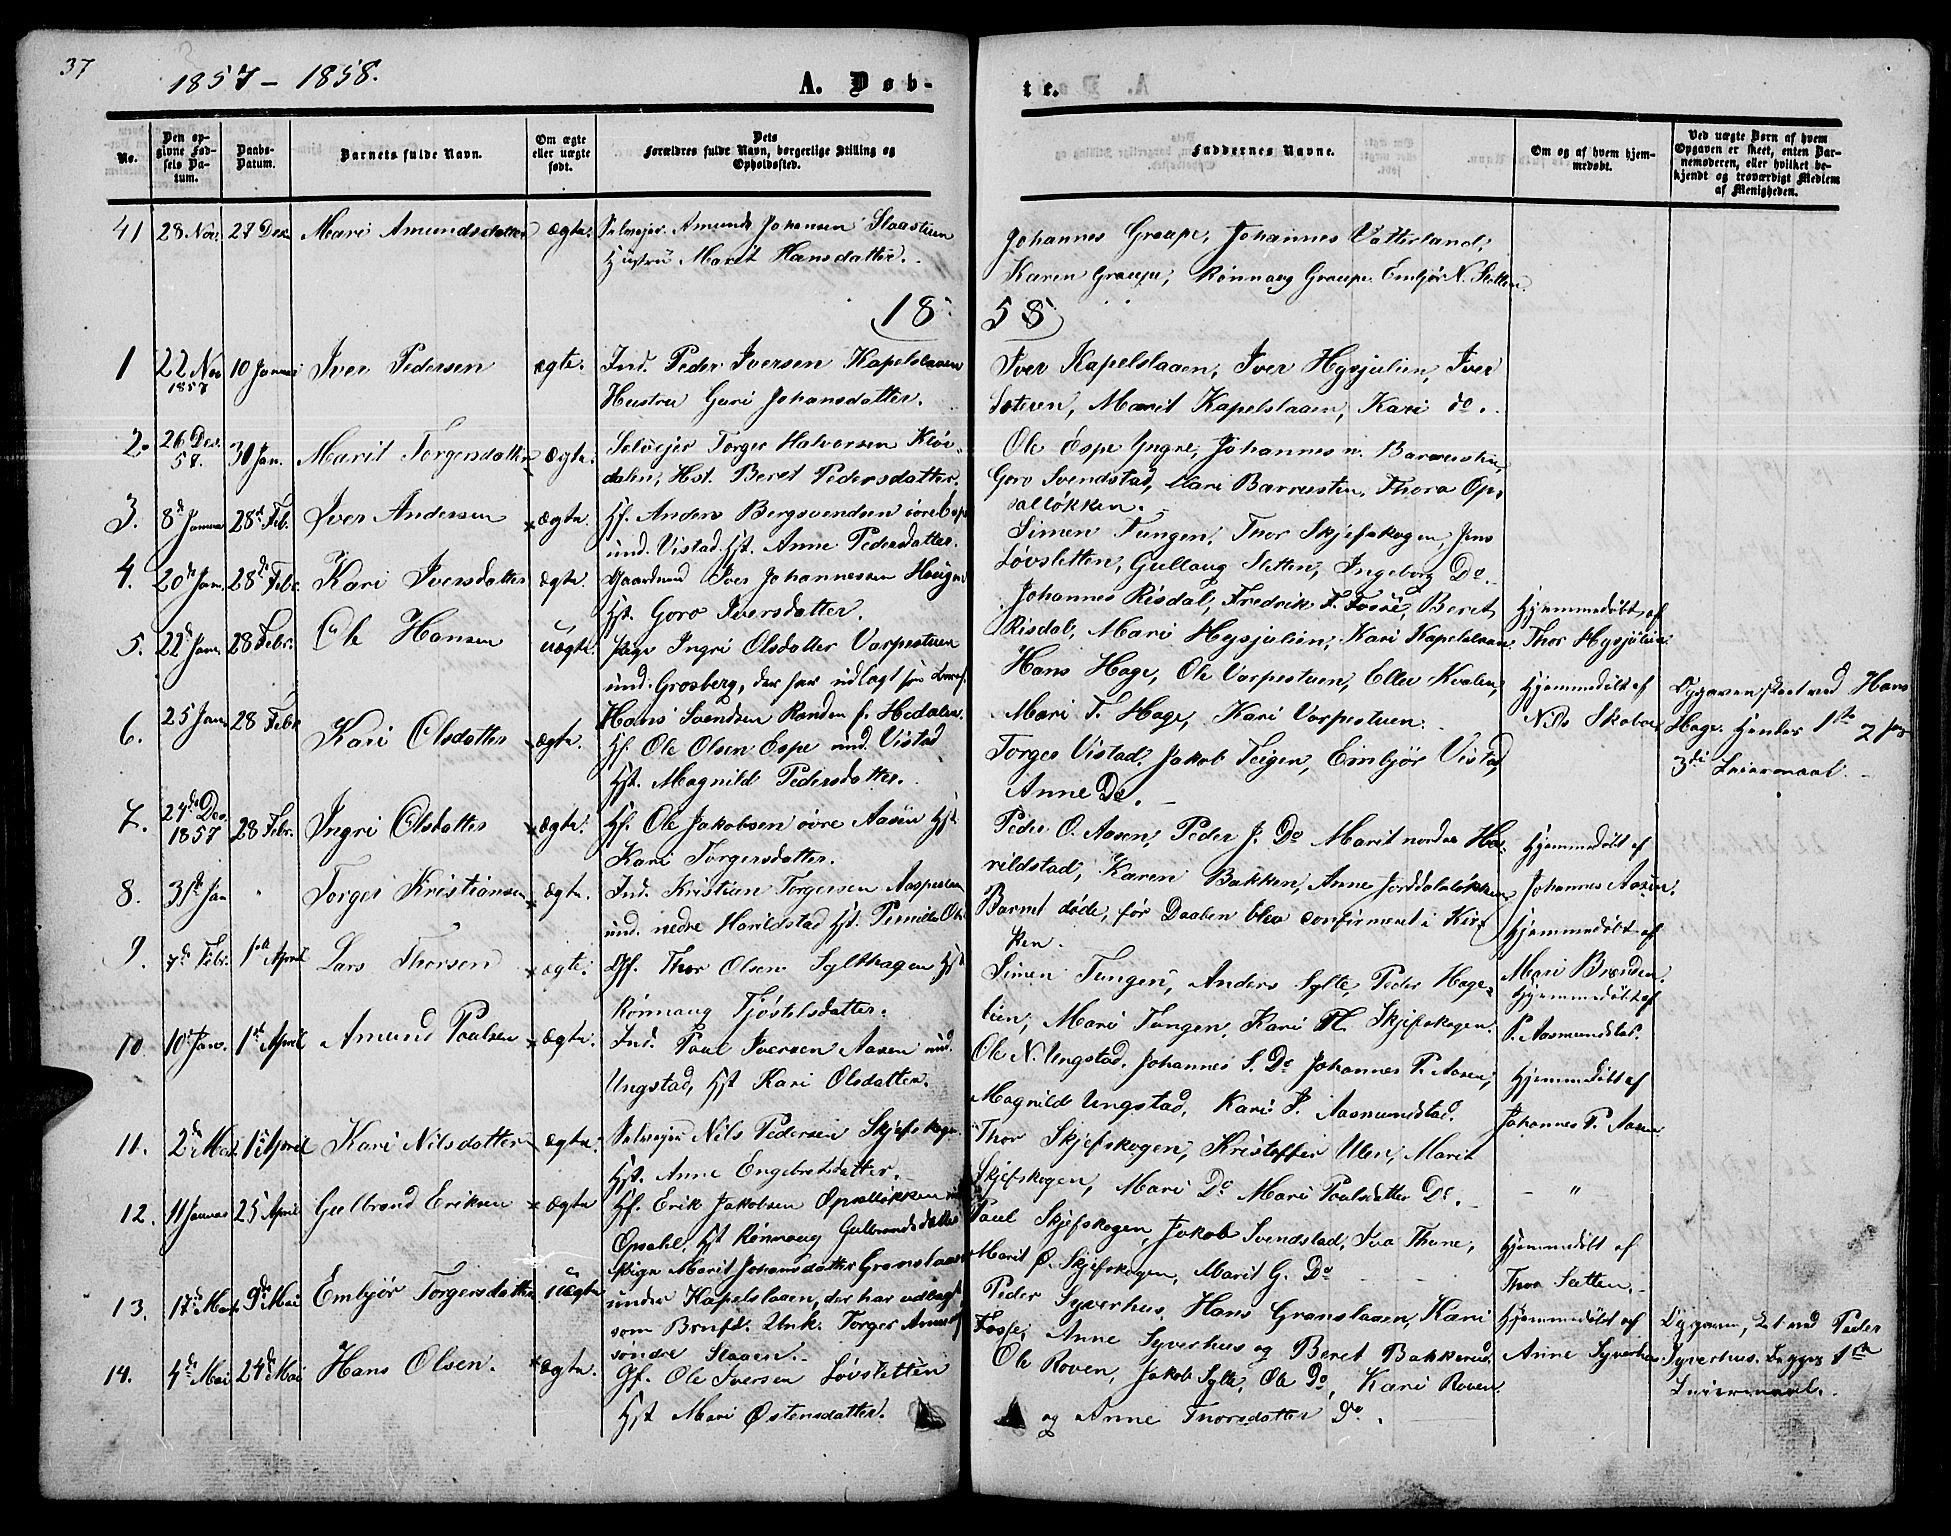 SAH, Nord-Fron prestekontor, Klokkerbok nr. 2, 1851-1883, s. 37